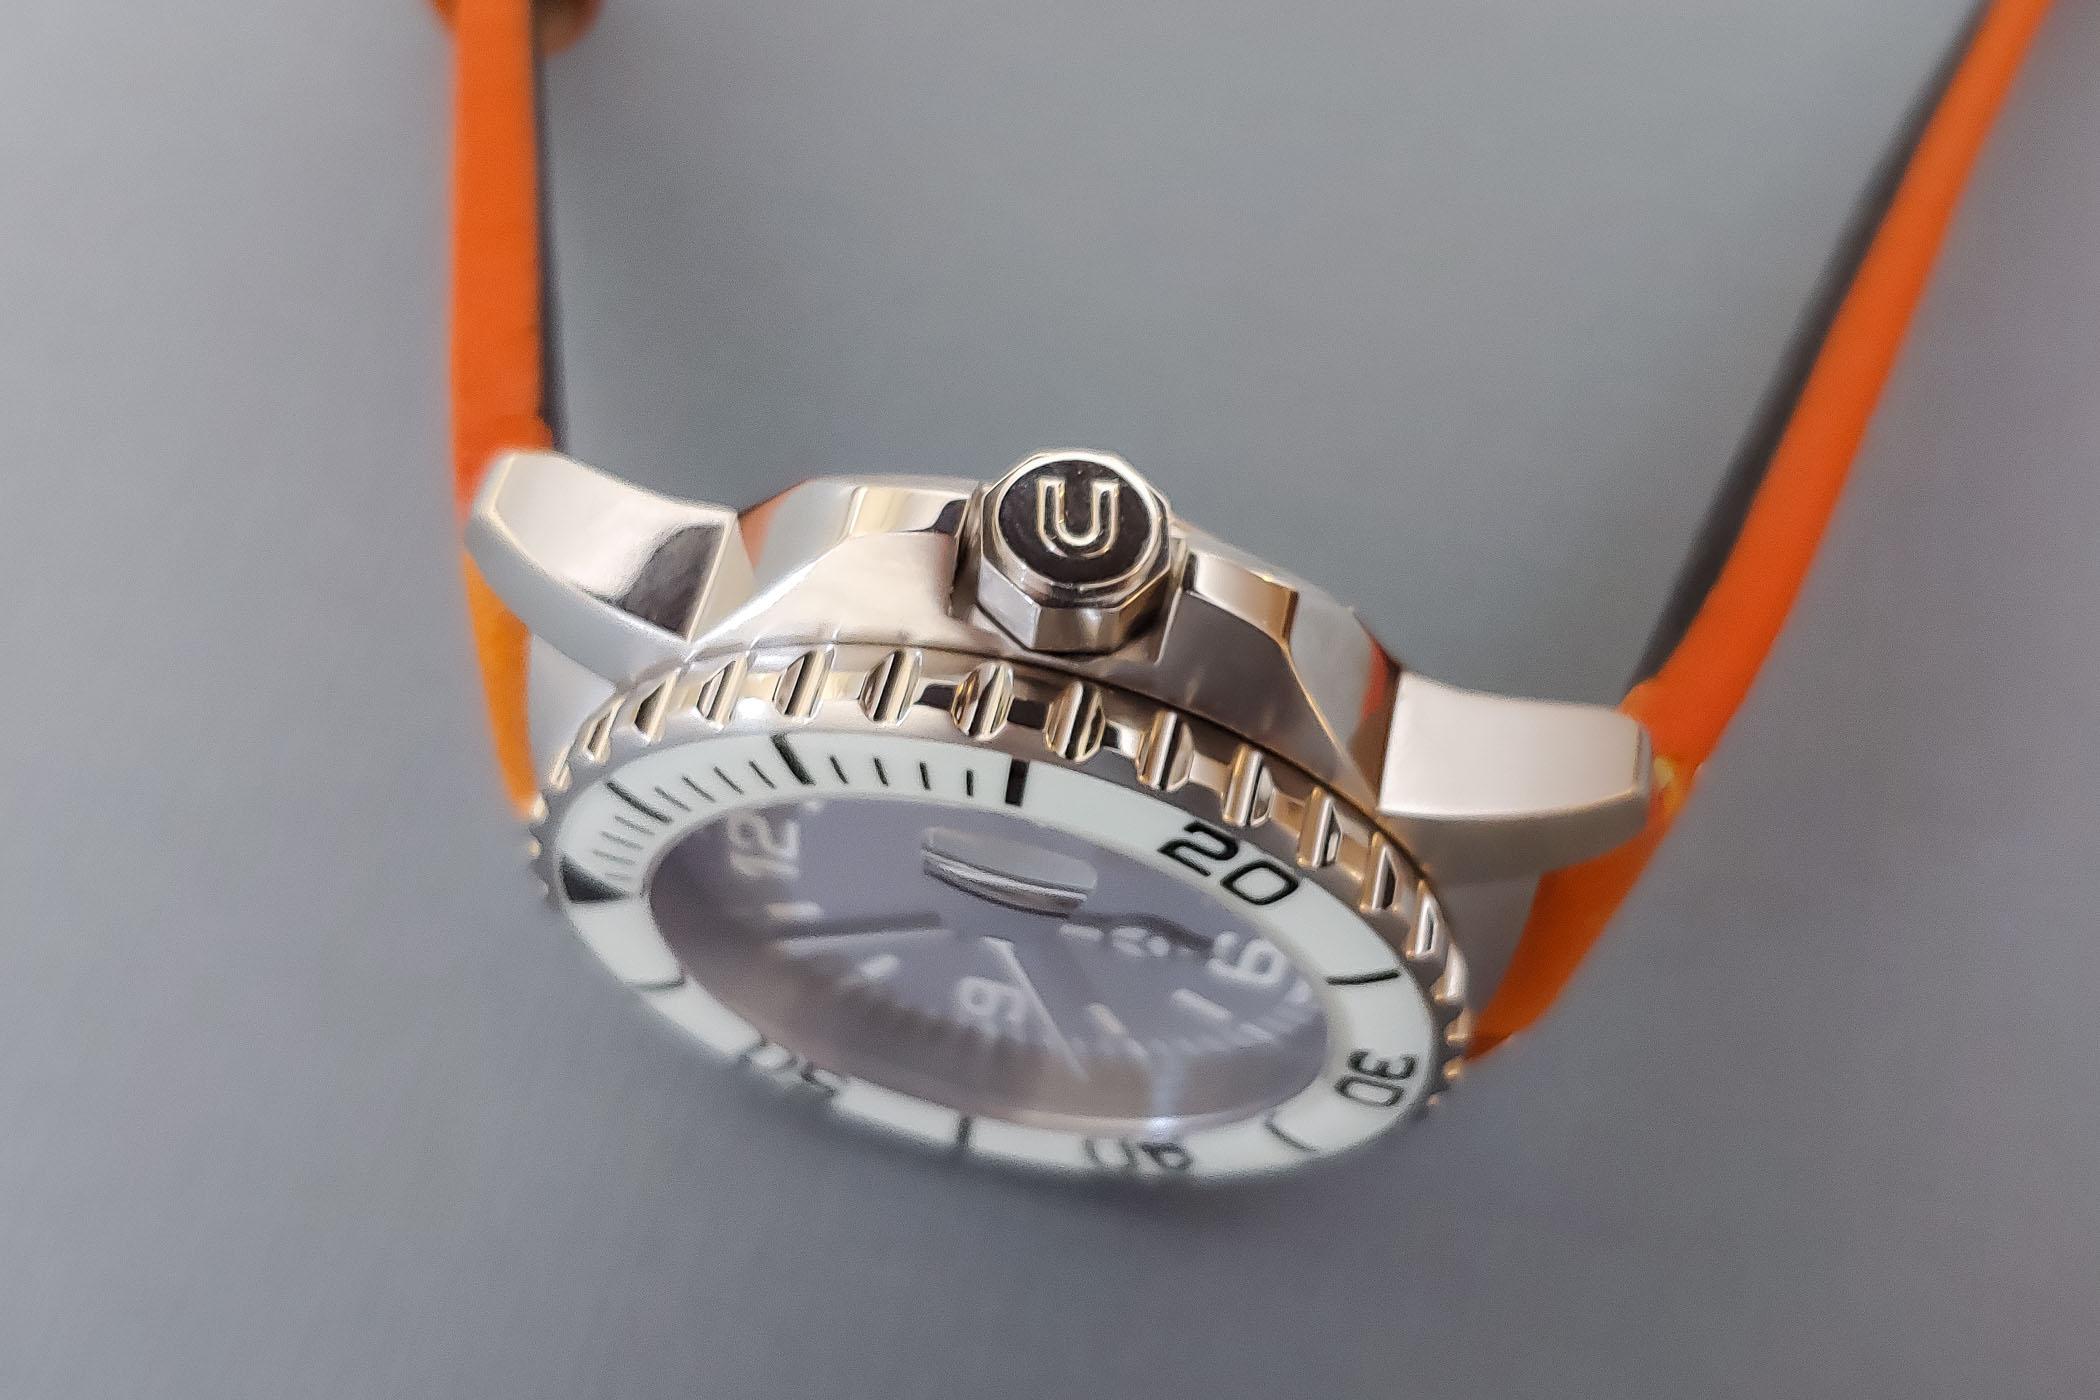 UNDONE Aqua Dive Watch automatic, customizable - review